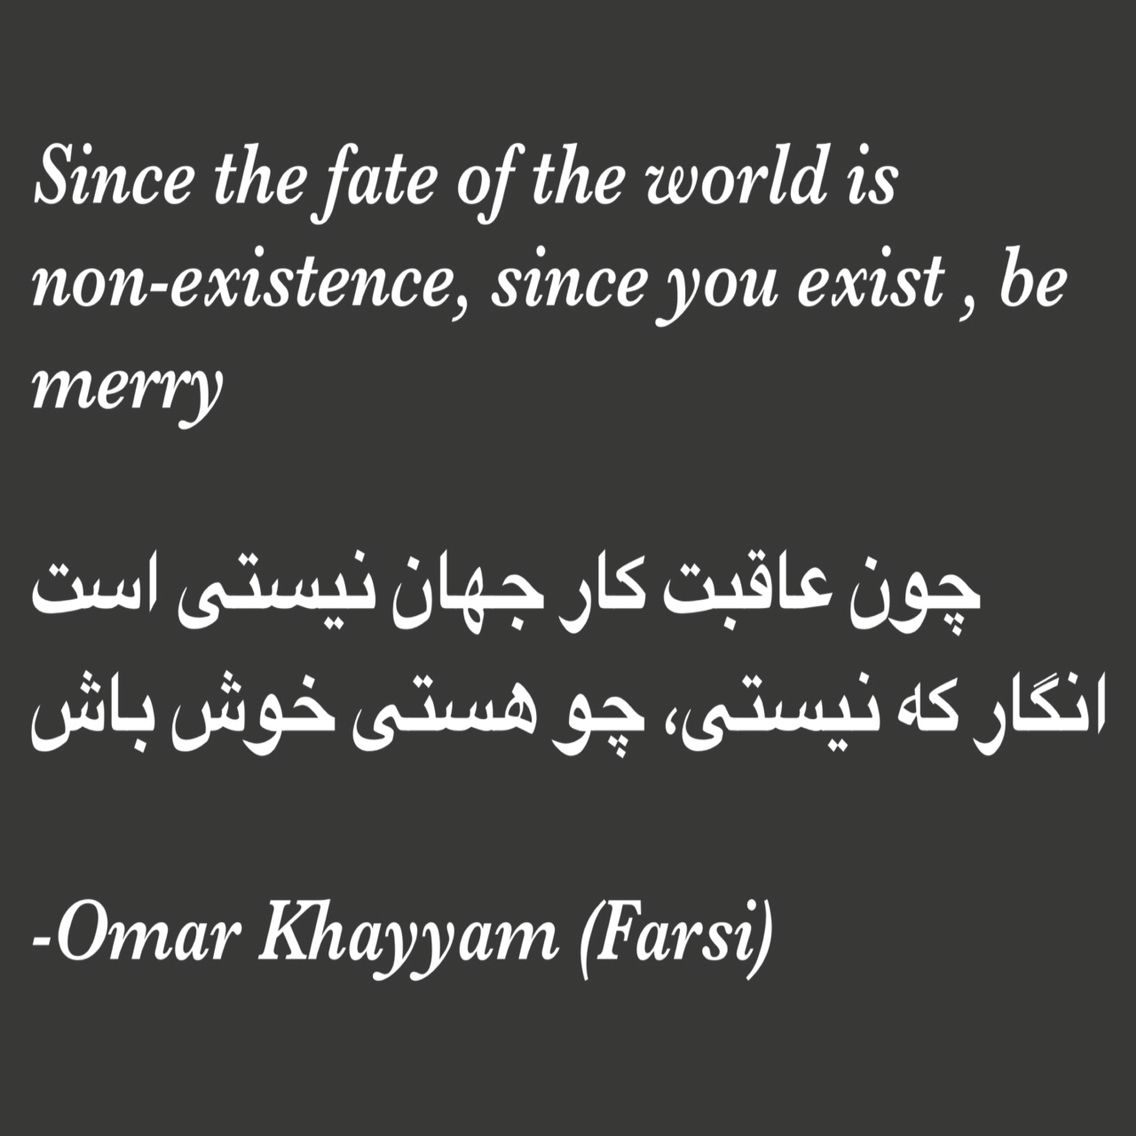 Amber Heard Farsi Perisan Tattoo Of Omar Khayyam He Was A